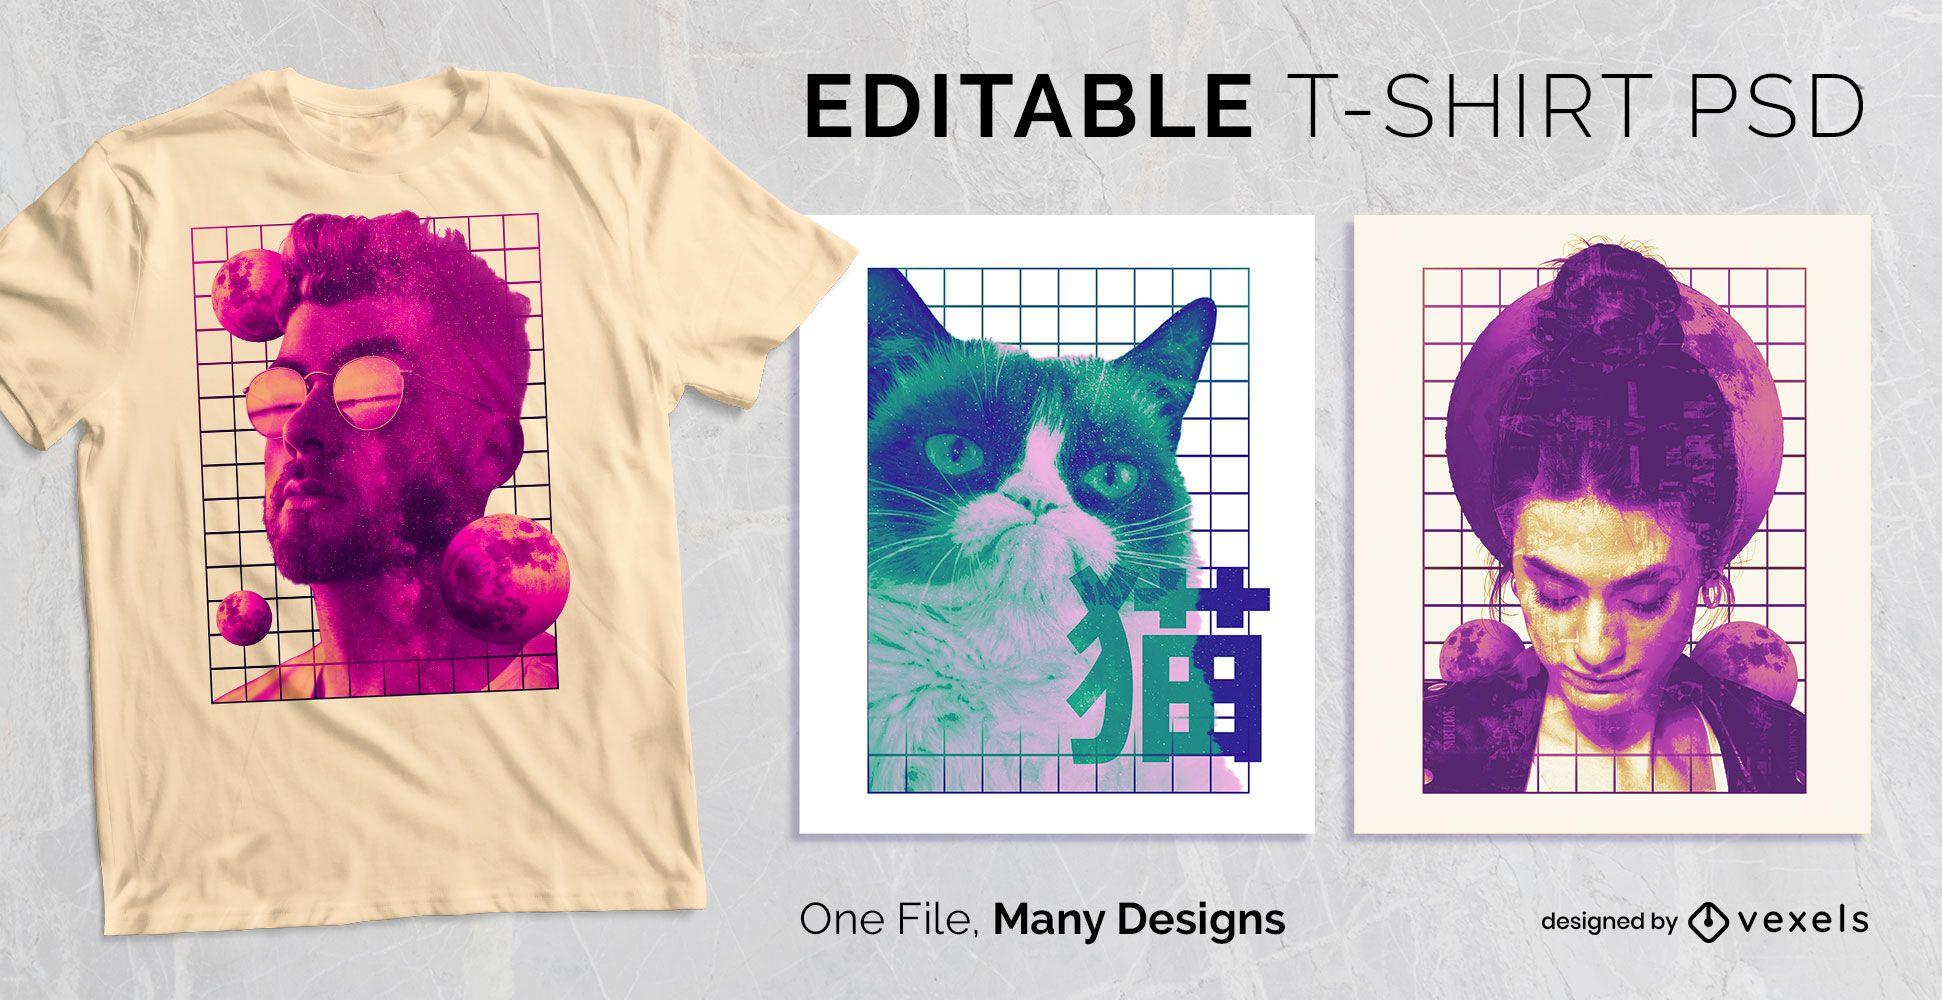 Grid Collage T-shirt Design PSD